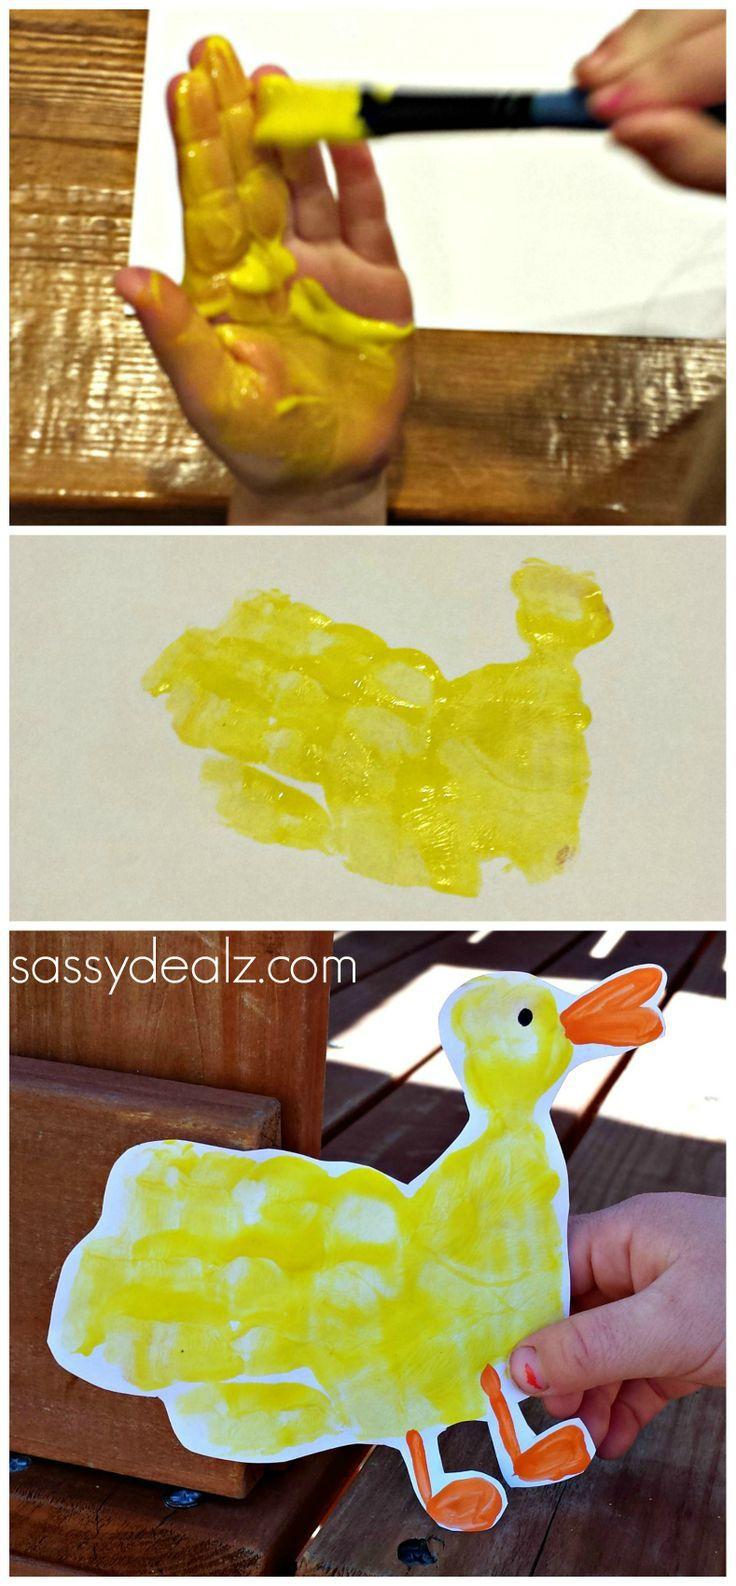 Duck Handprint Craft for Kids #DIY #Duck art project | CraftyMorning.com